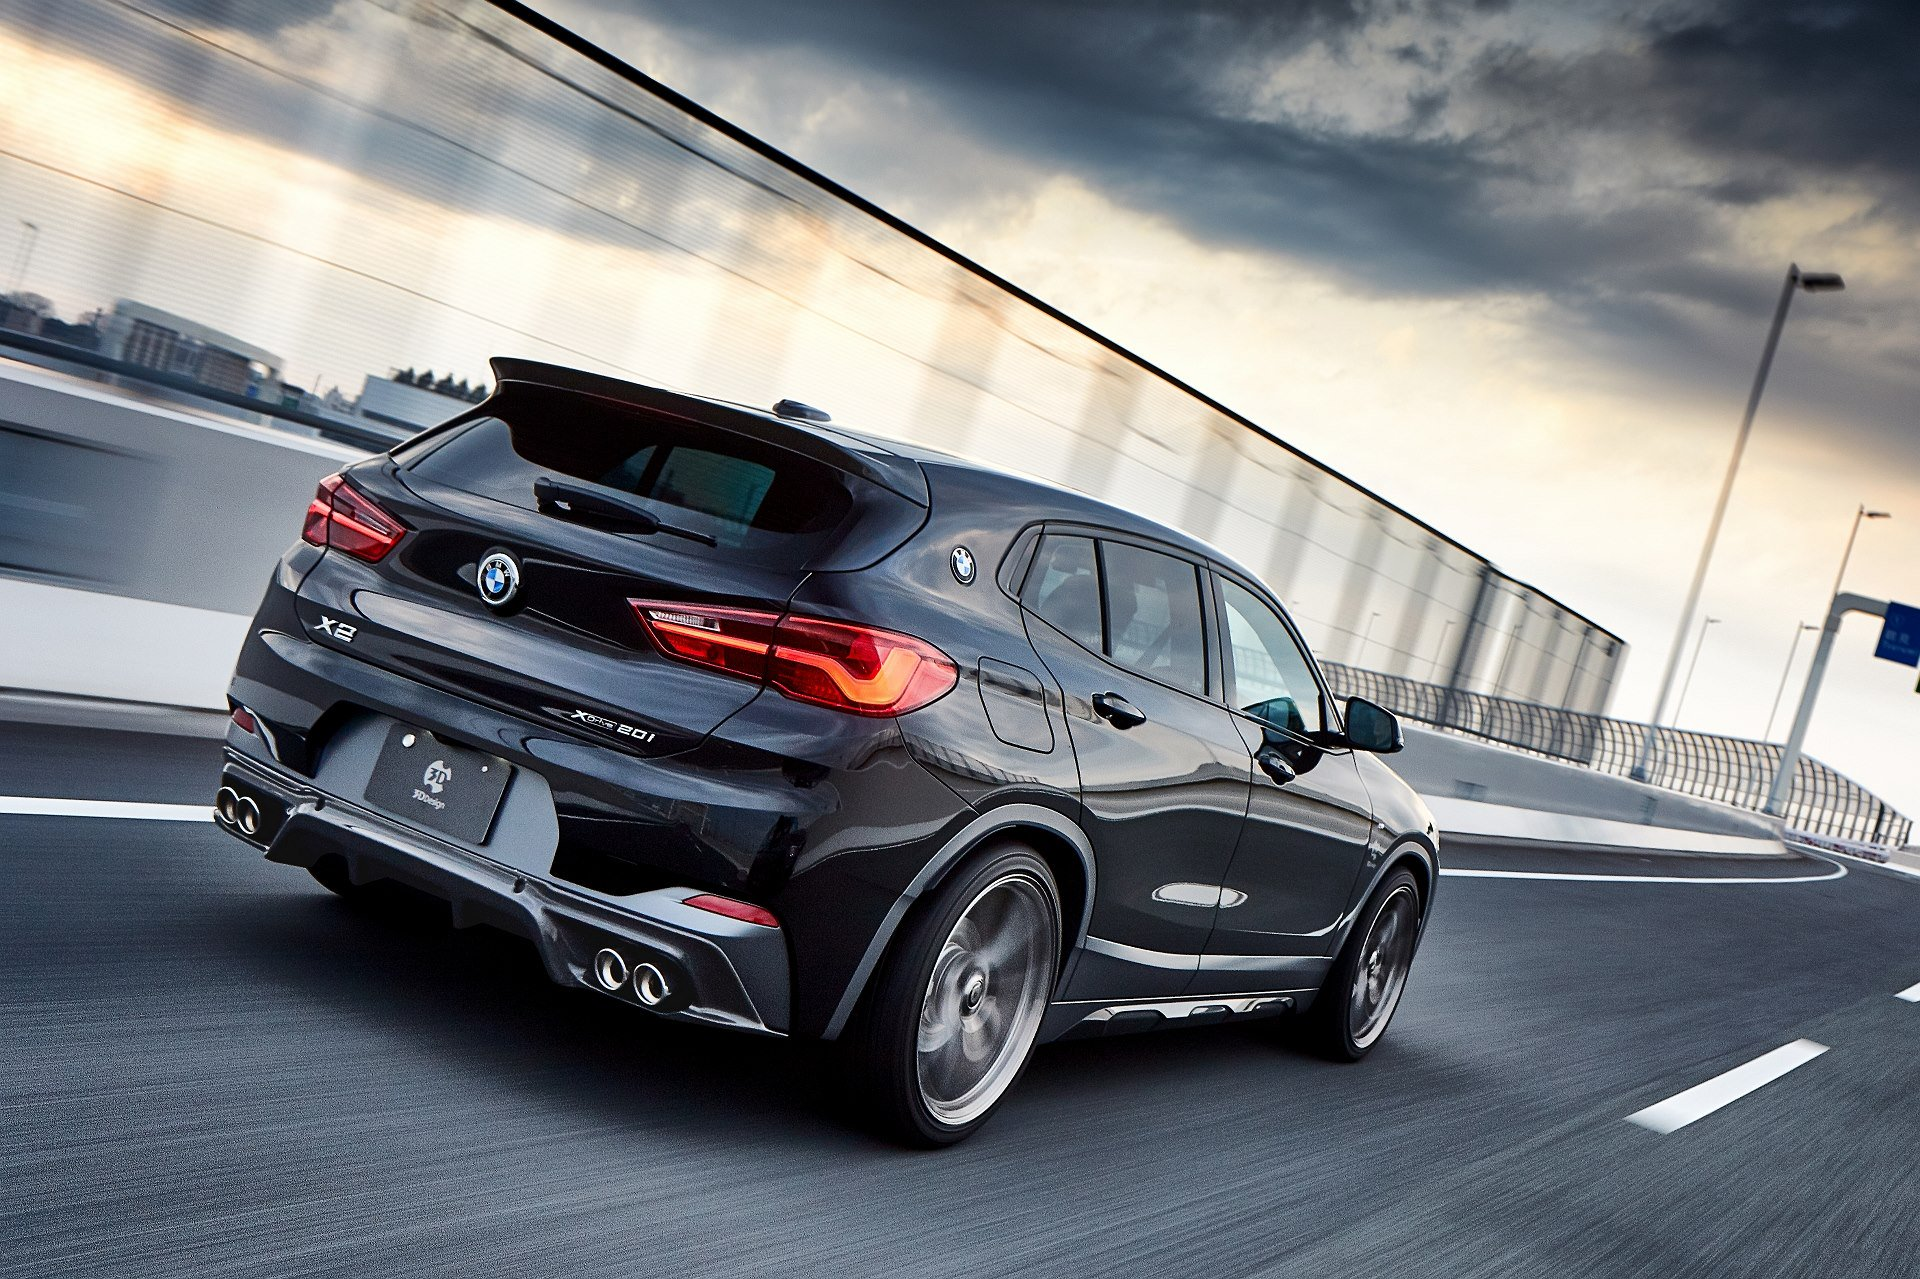 BMW X2 by 3D Design (2)